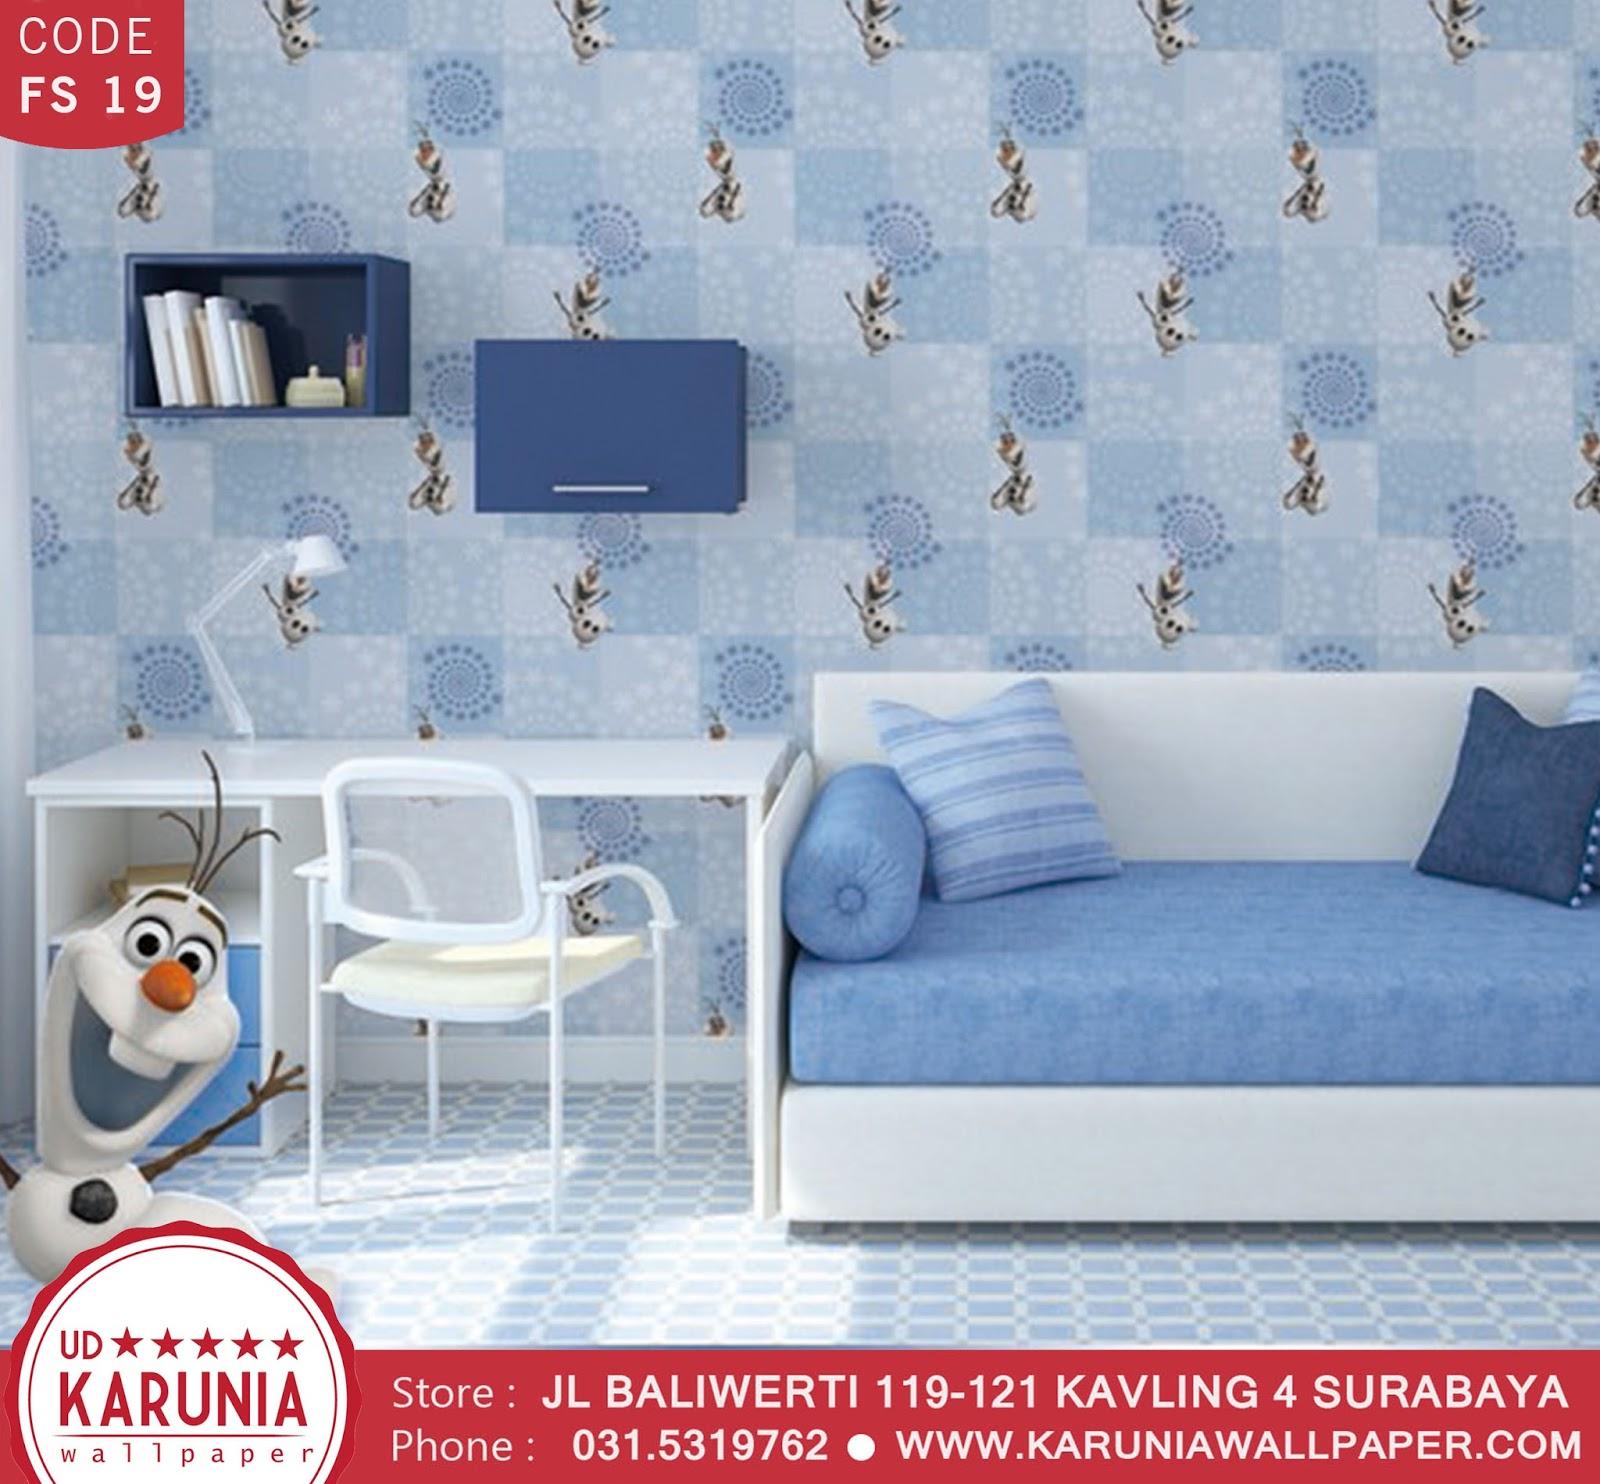 jual wallpaper frozen karuniawallpaper surabaya